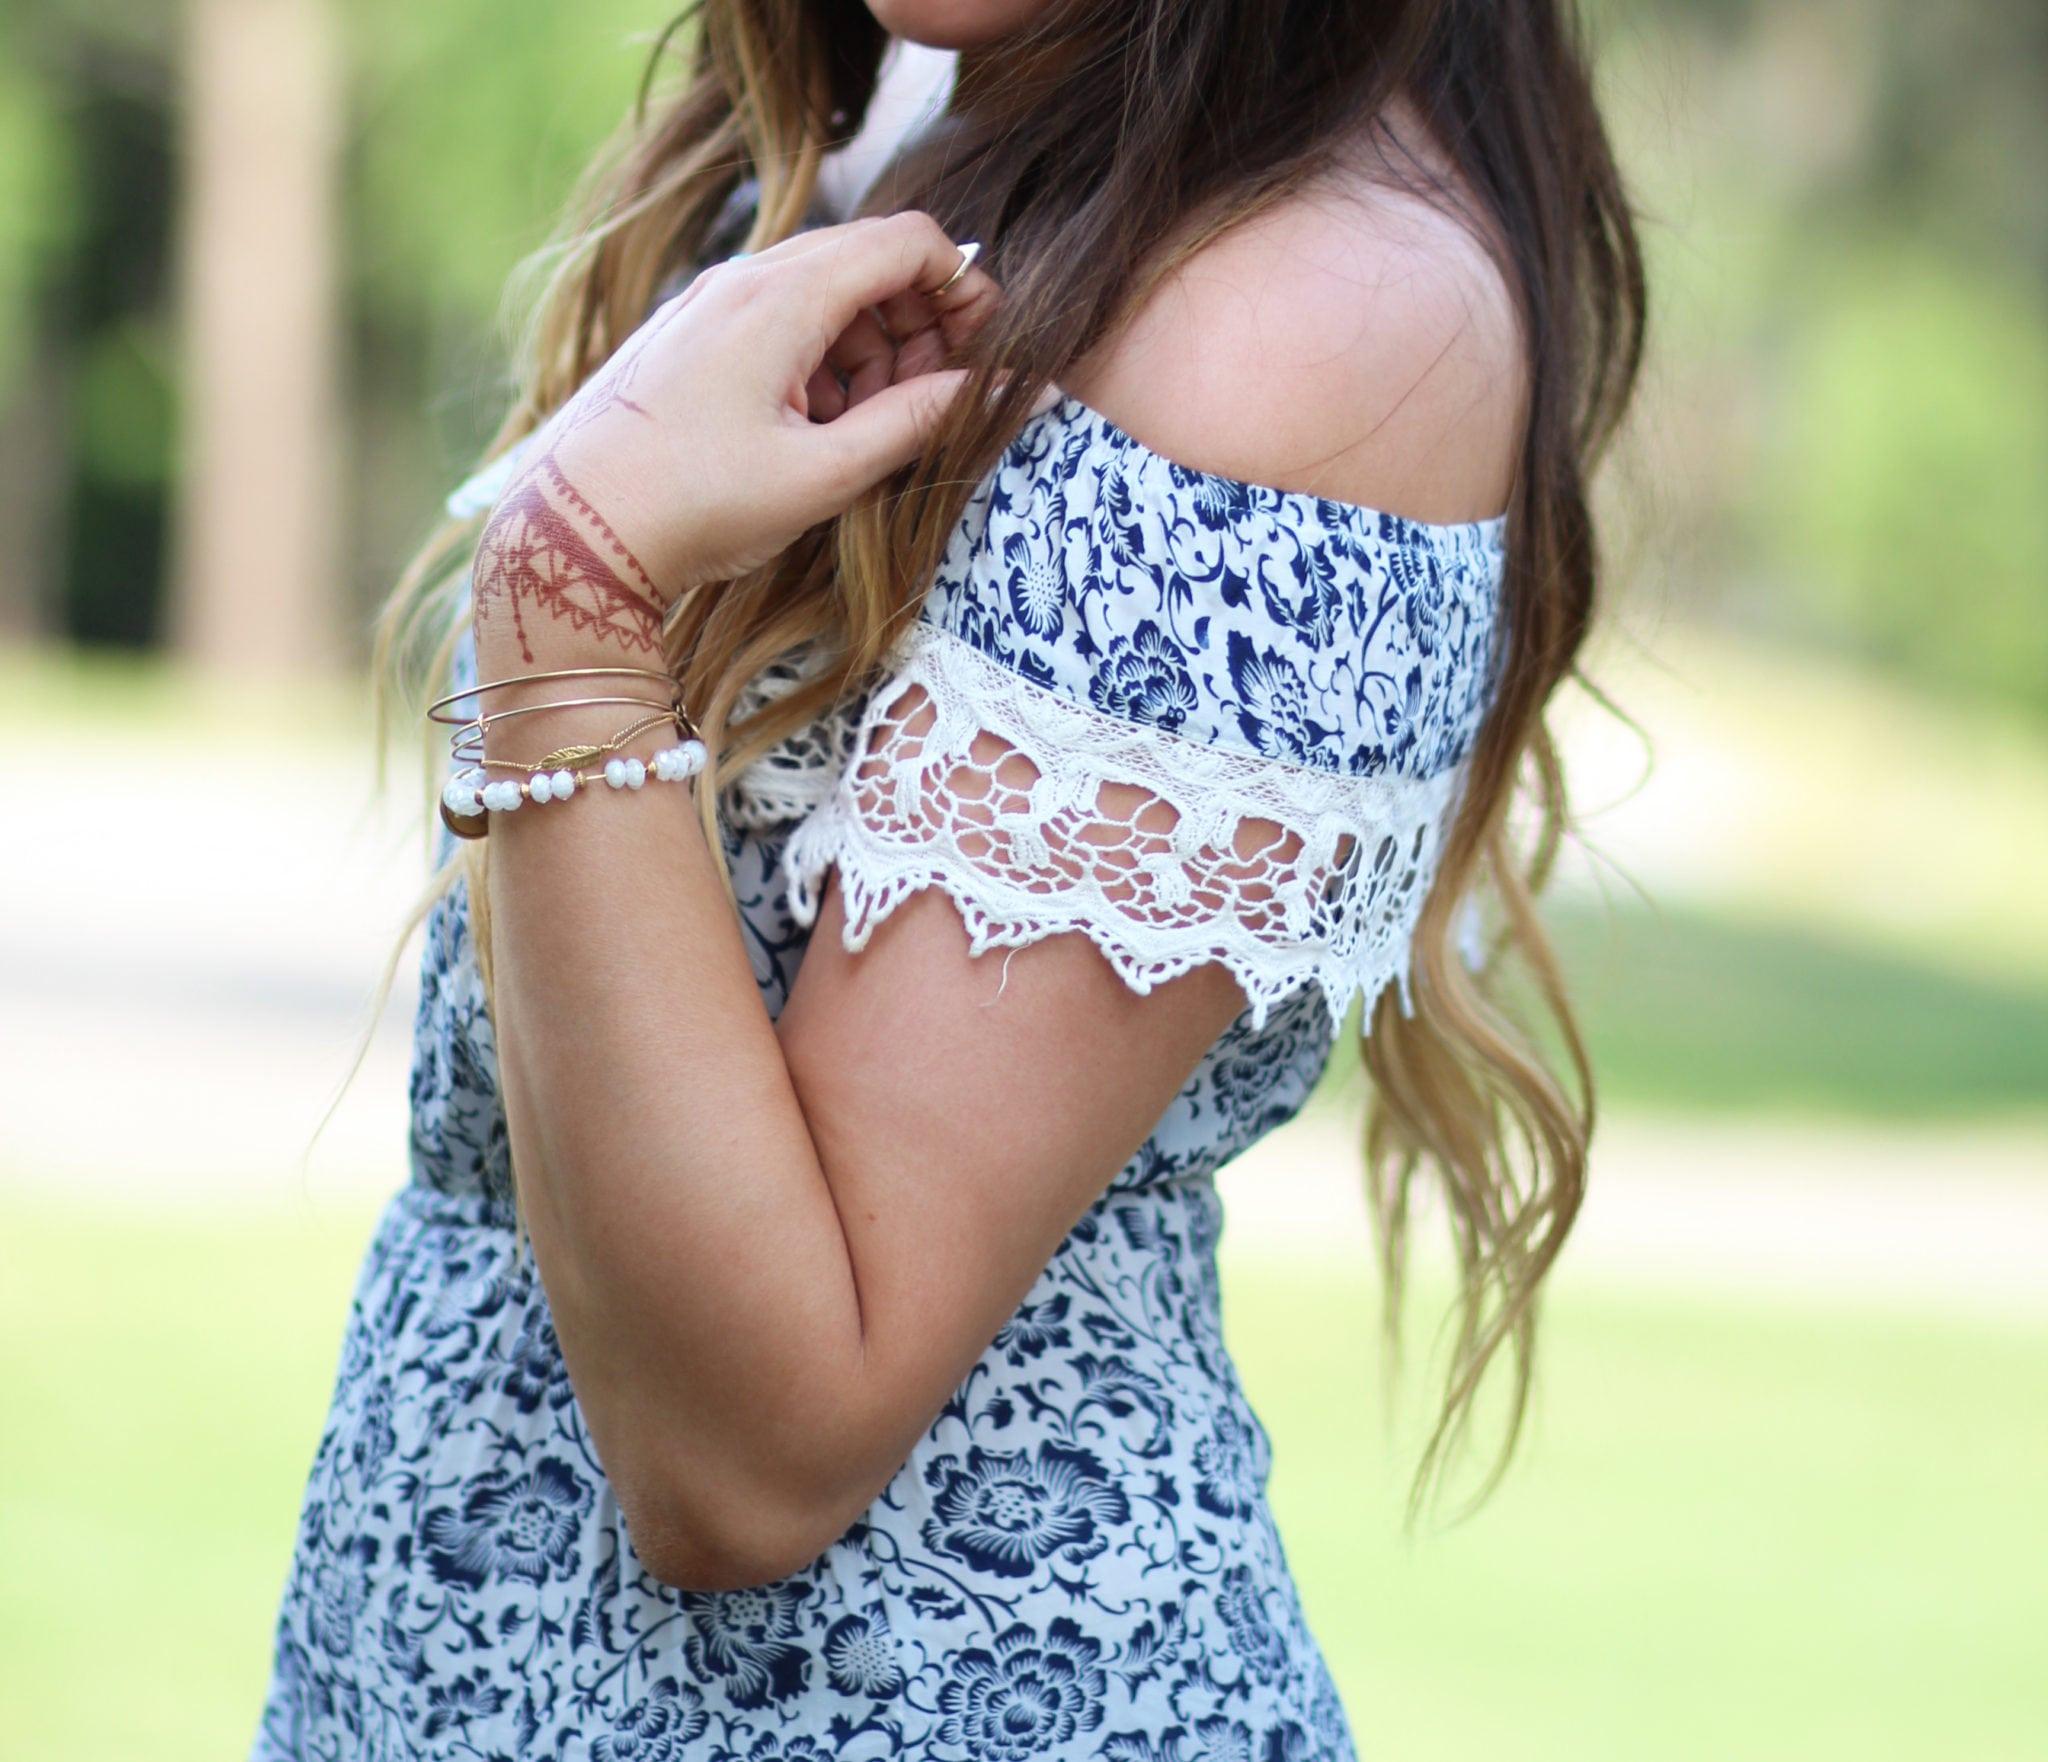 Henna Art | DIY Henna art | Henna | tattoo | traditions | off the shoulder dress | floral print dress | Mash elle beauty blogger